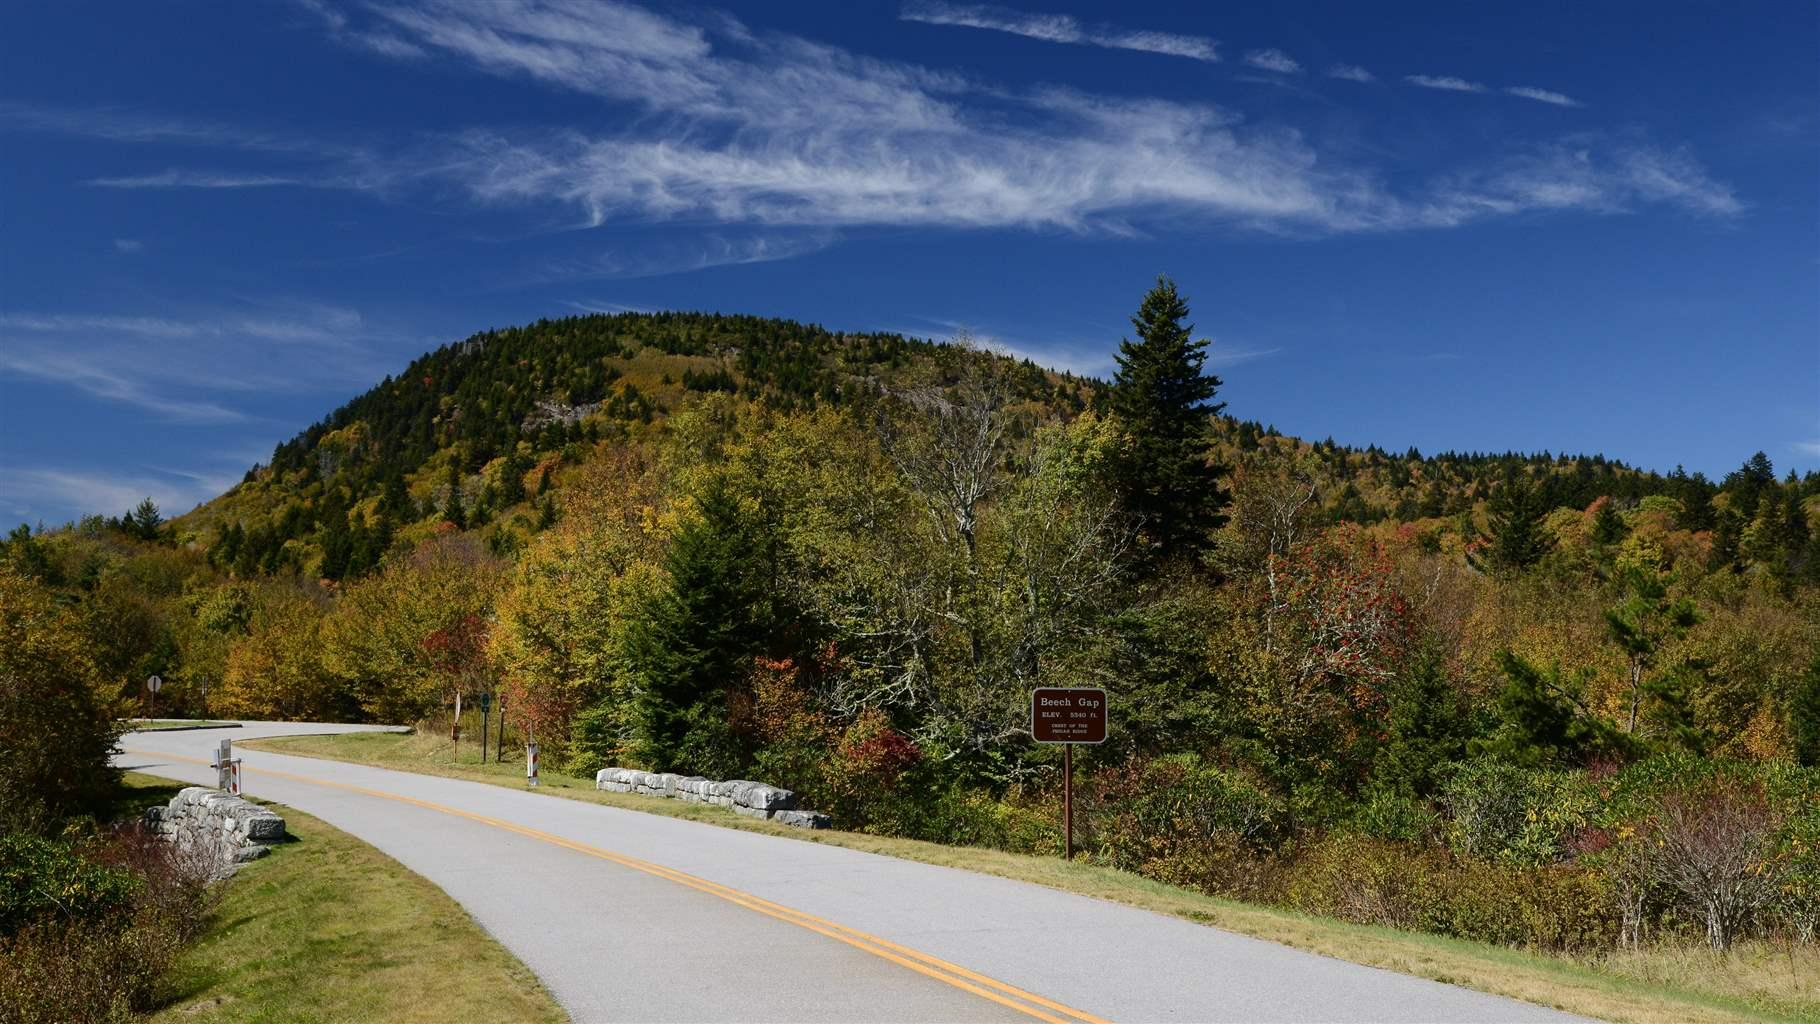 At Milepost 423.3 in North Carolina, the Blue Ridge Parkway passes through Beech Gap at an elevation of 5,340 ft.